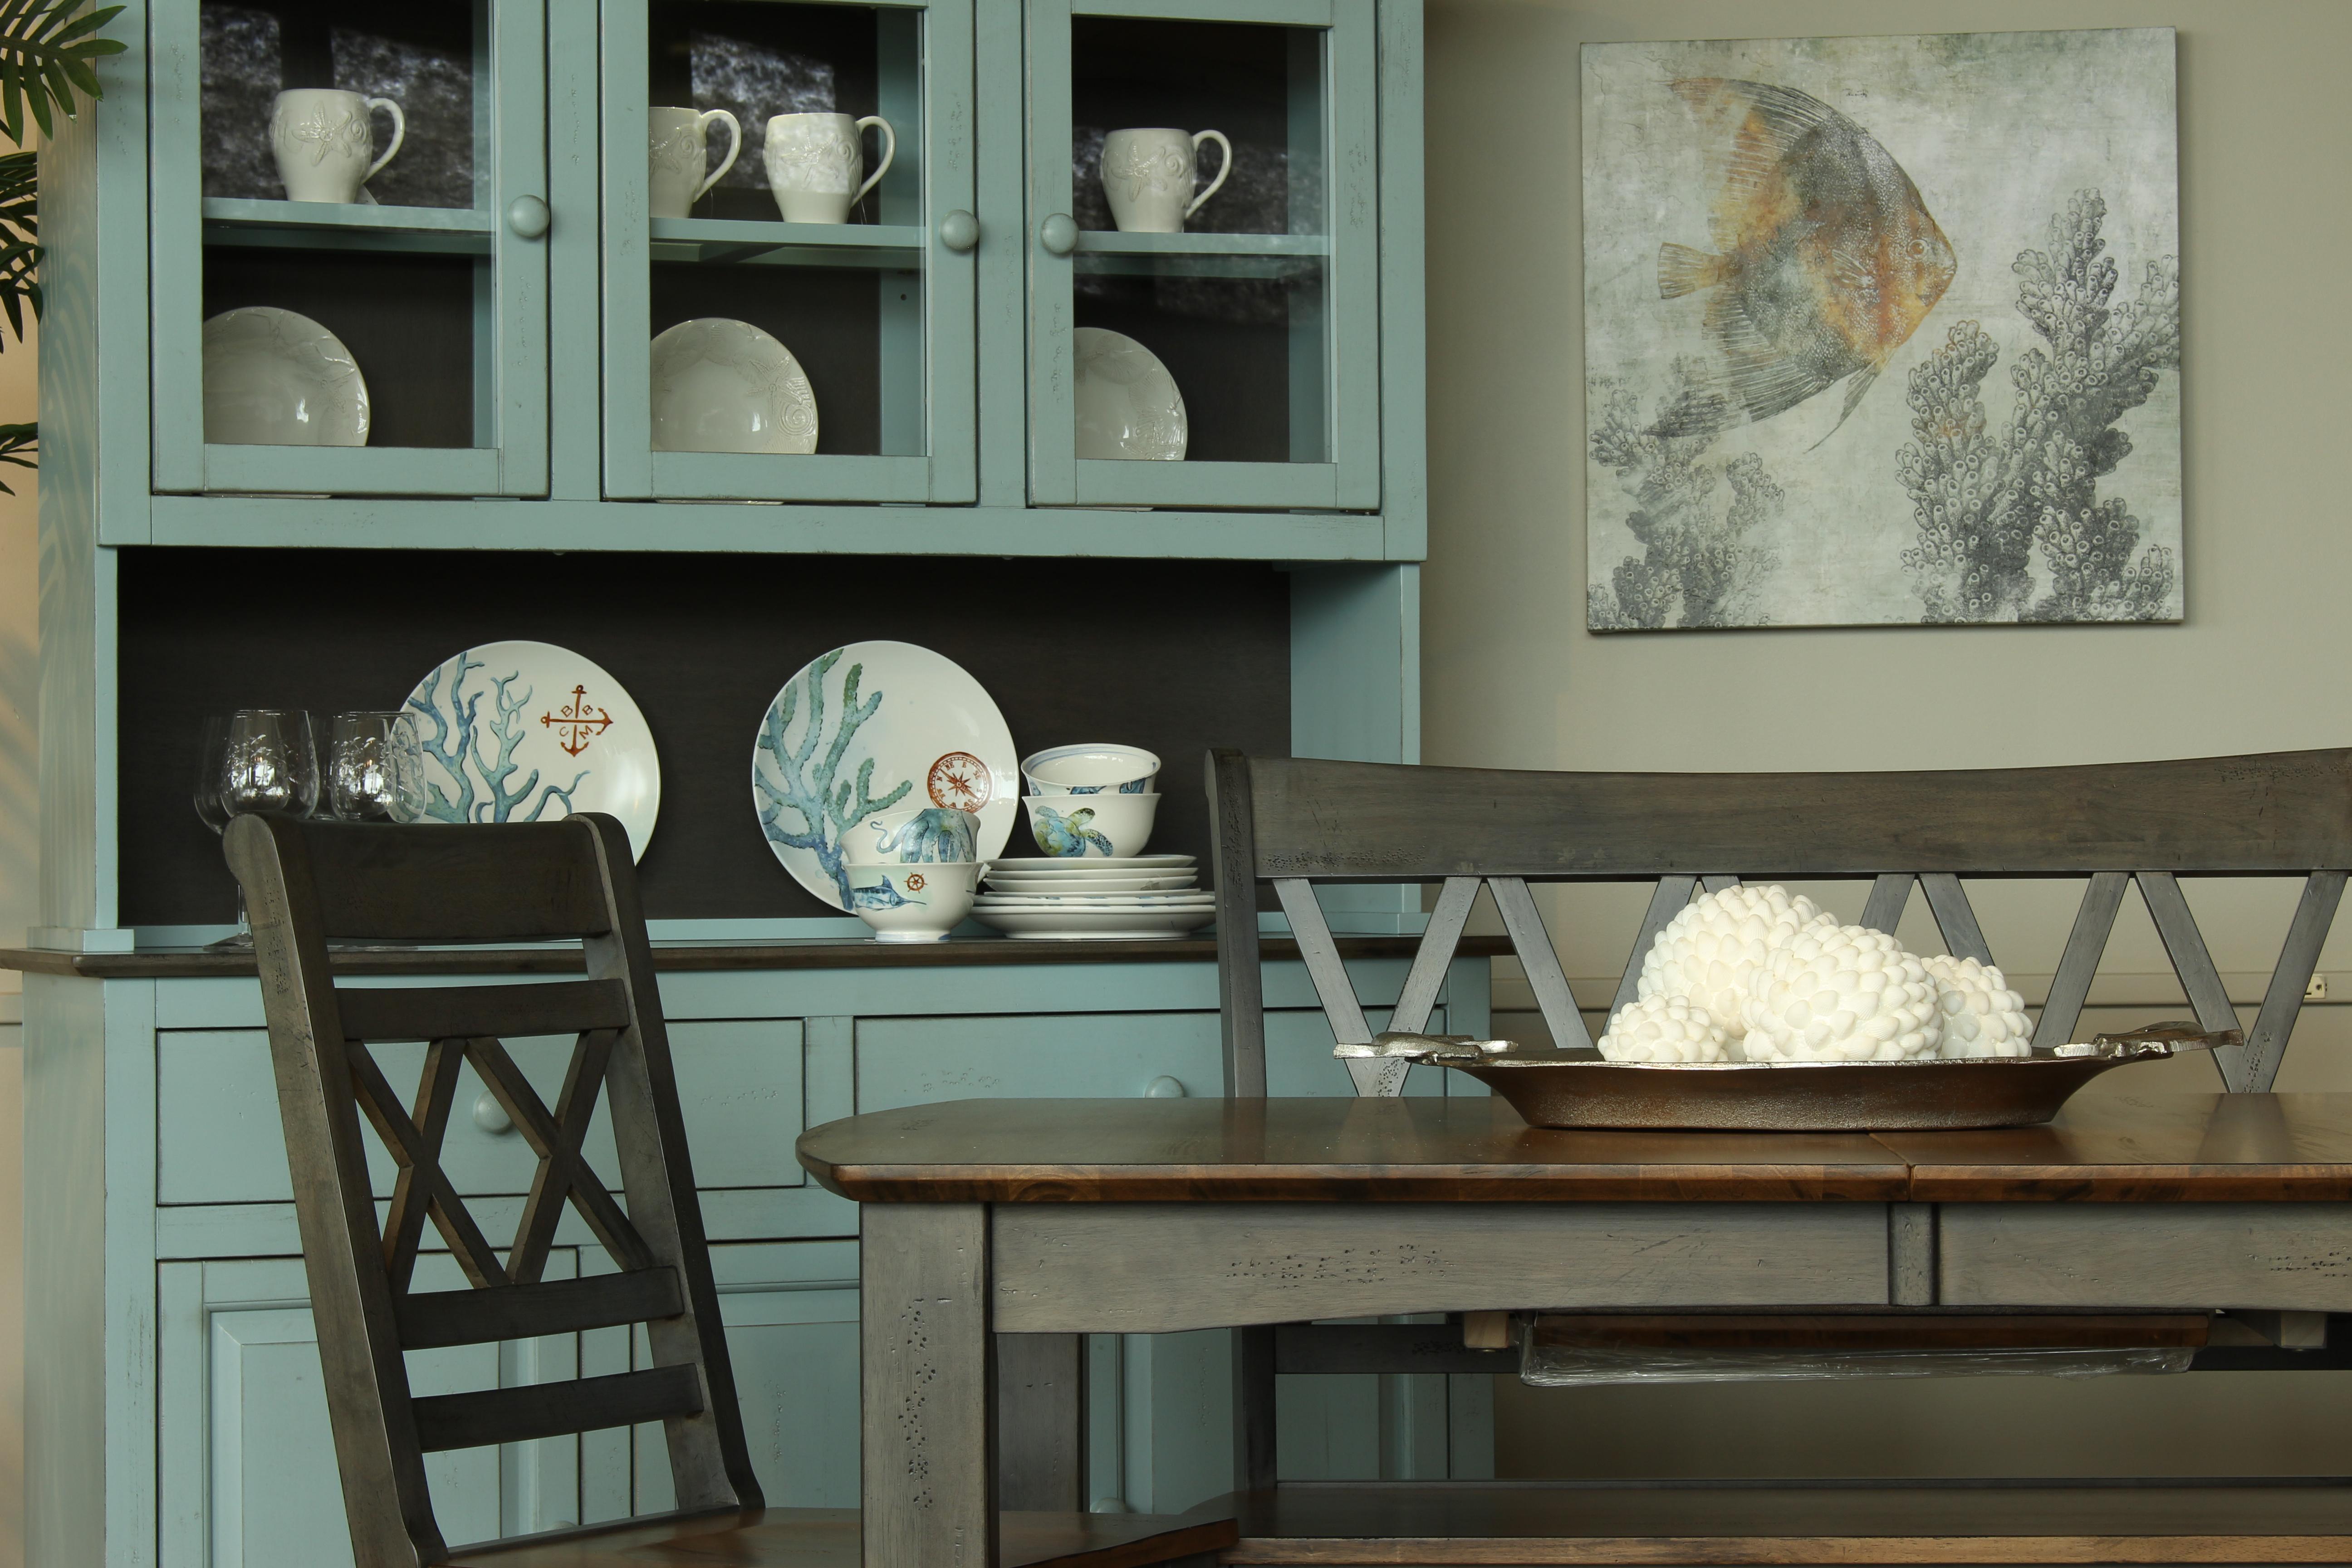 Oskar Huber Furniture U0026 Design | Furniture Stores At 101 W. 8th Street    Ship Bottom NJ